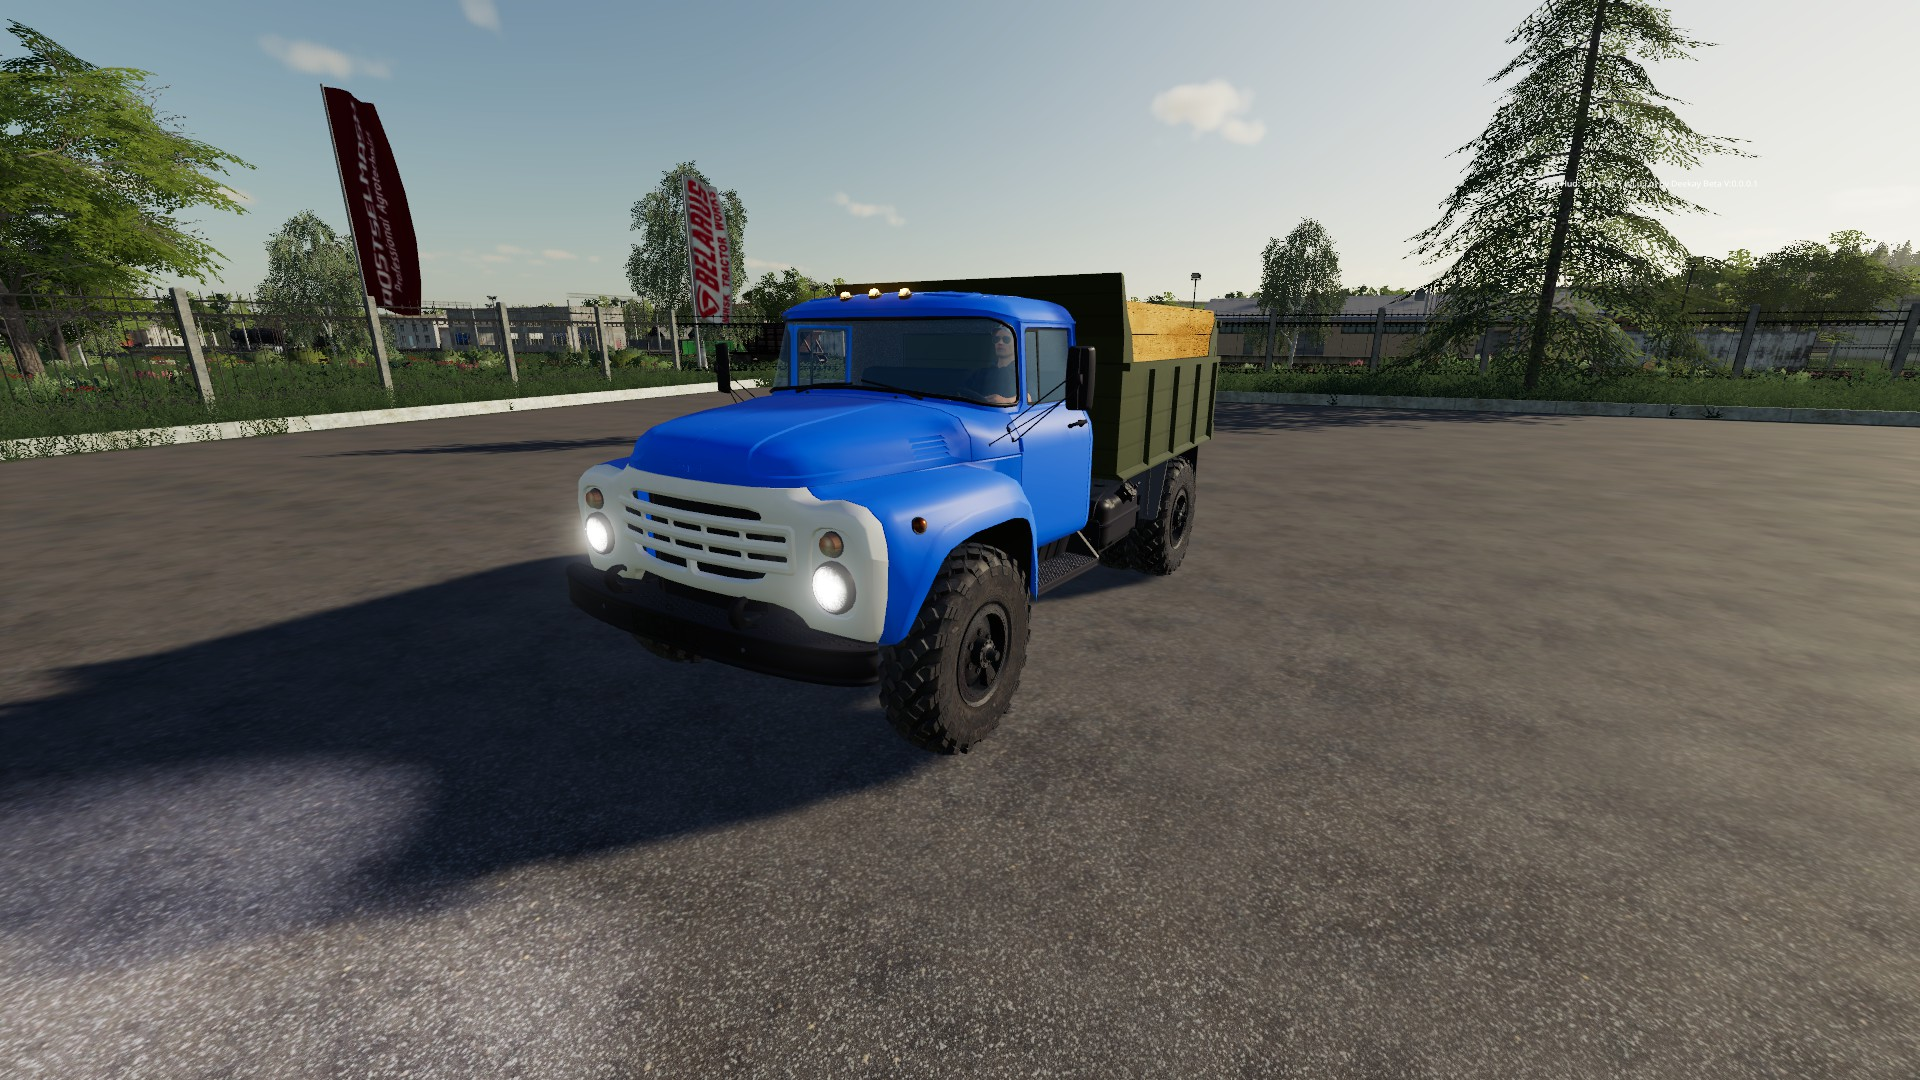 ЗИЛ 4502 v1.0 для Farming Simulator 2019